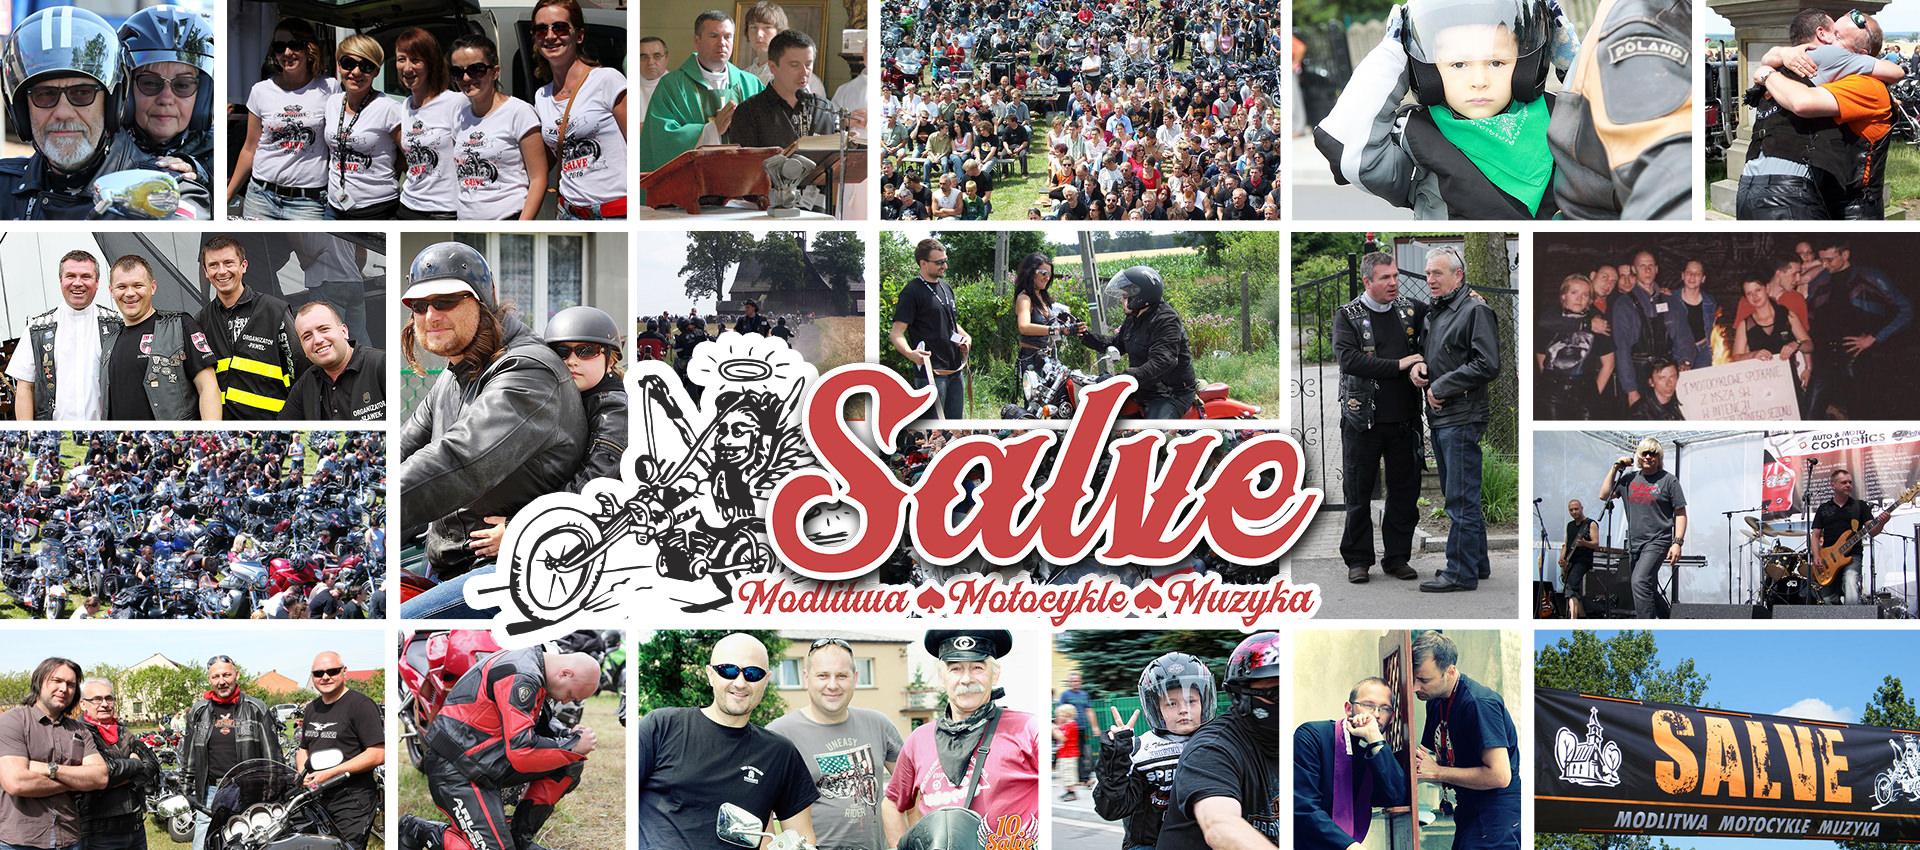 Salve - Modlitwa, Motocykle, Muzyka